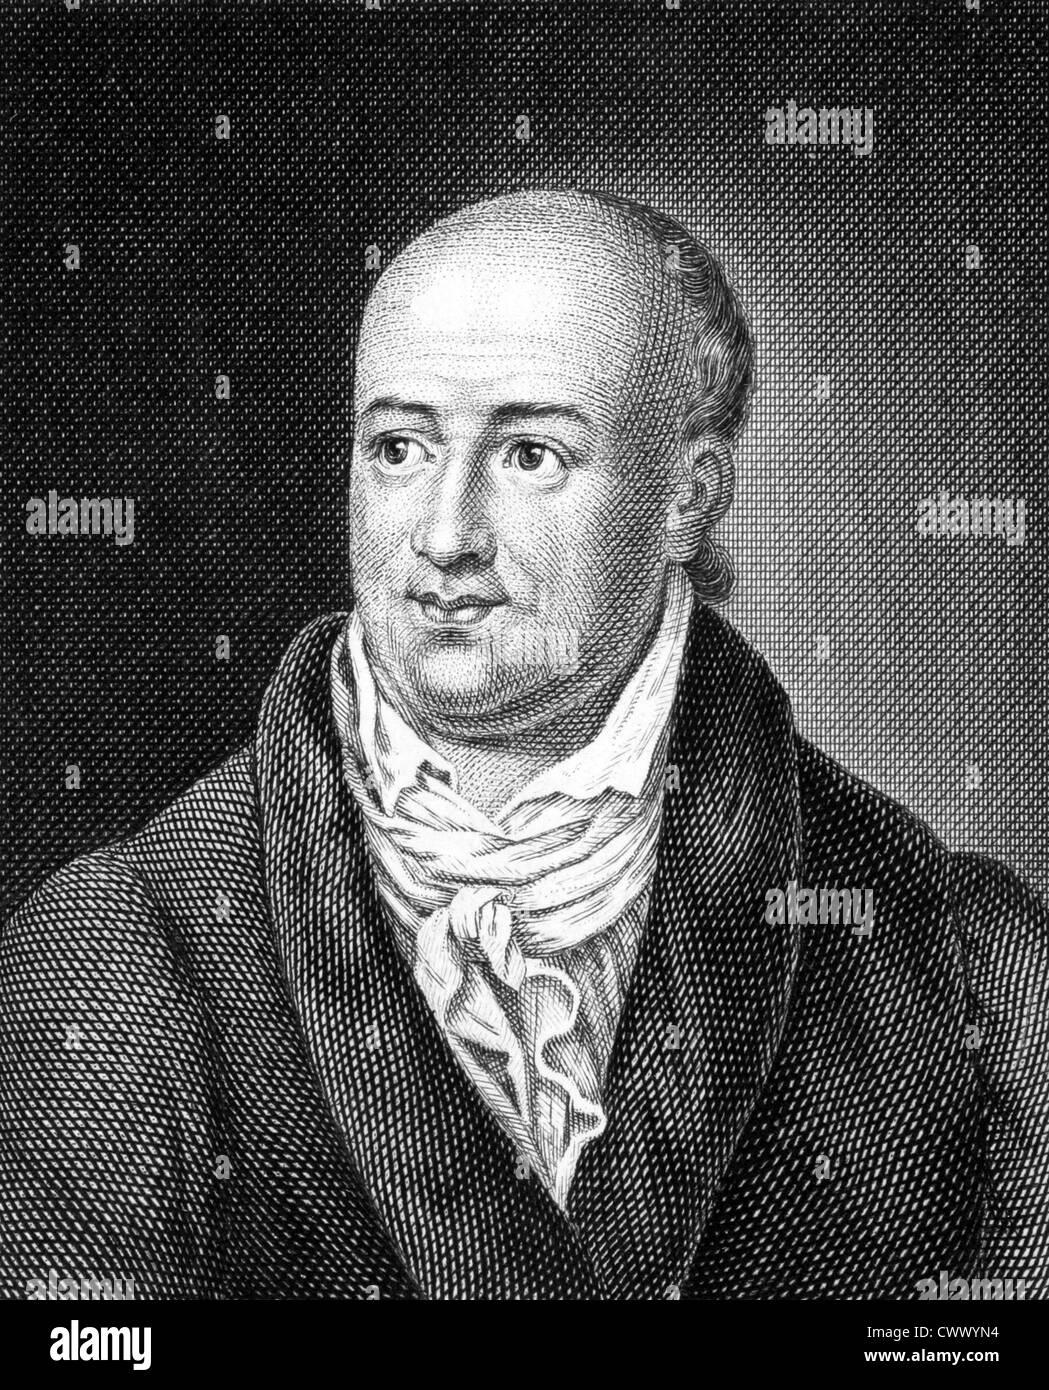 Salomon Gessner (1730-1788) on engraving from 1859. Swiss idyll poet, painter and printmaker. - Stock Image